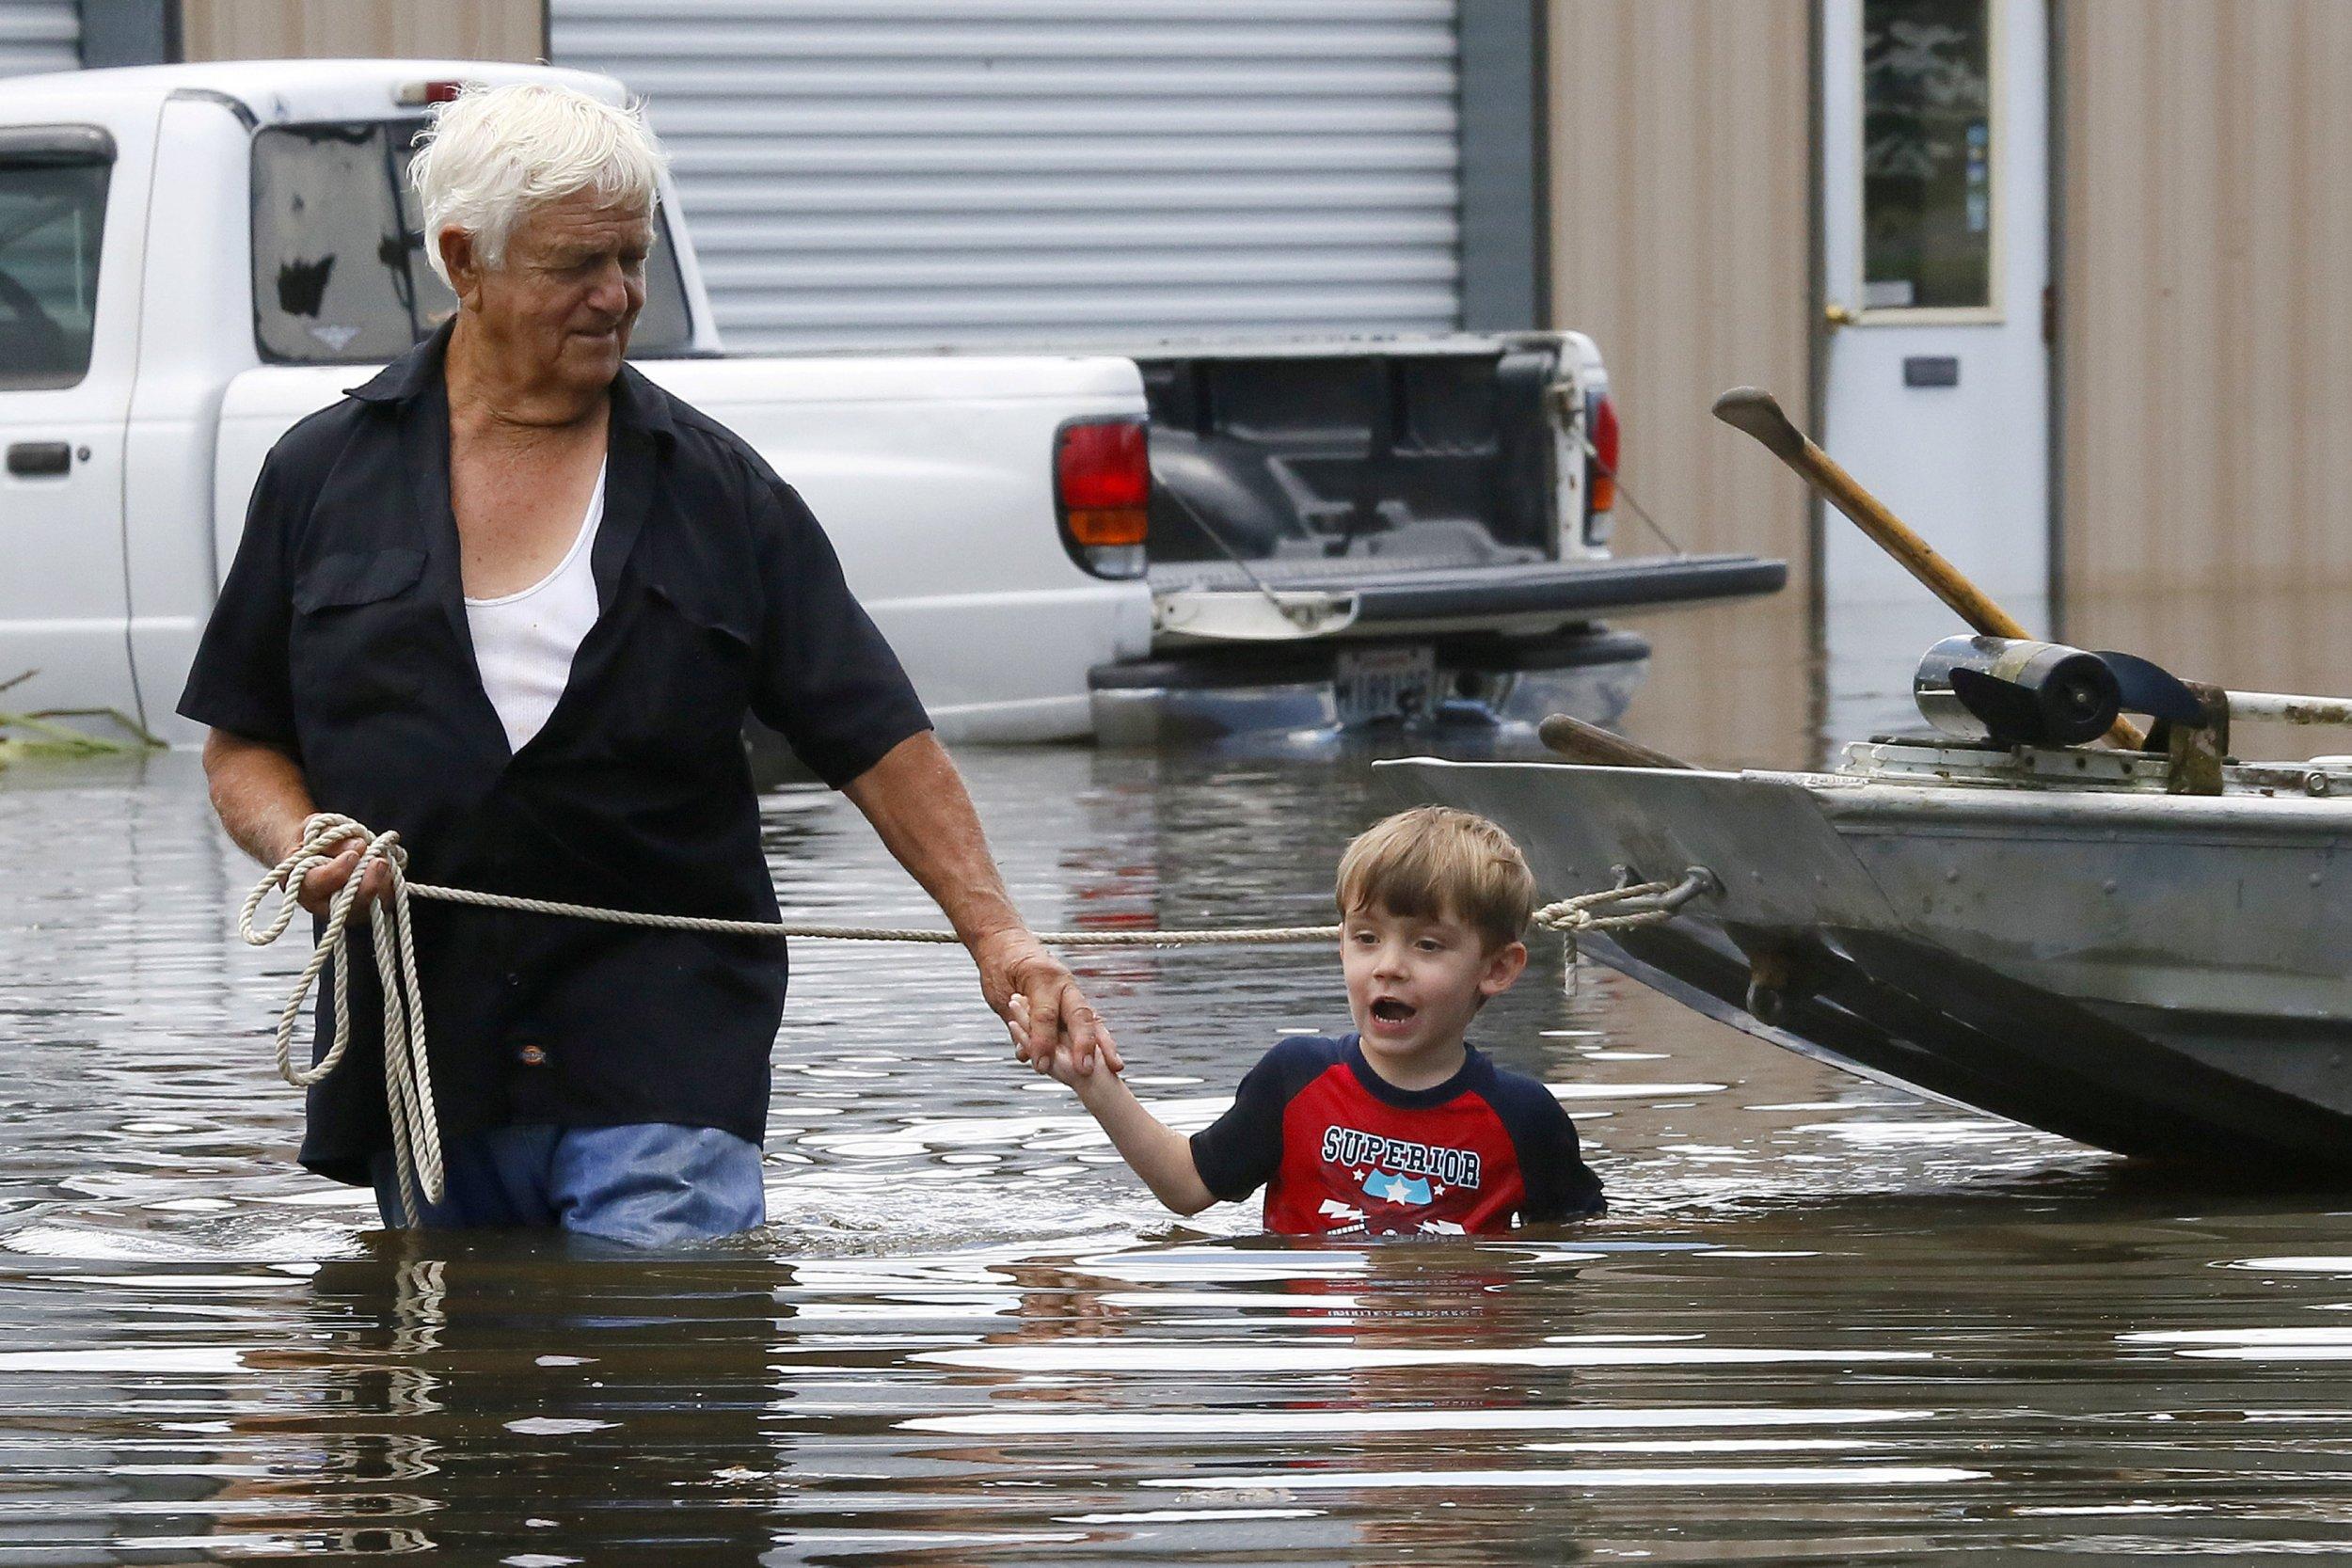 08_21_Louisiana_Flood_01